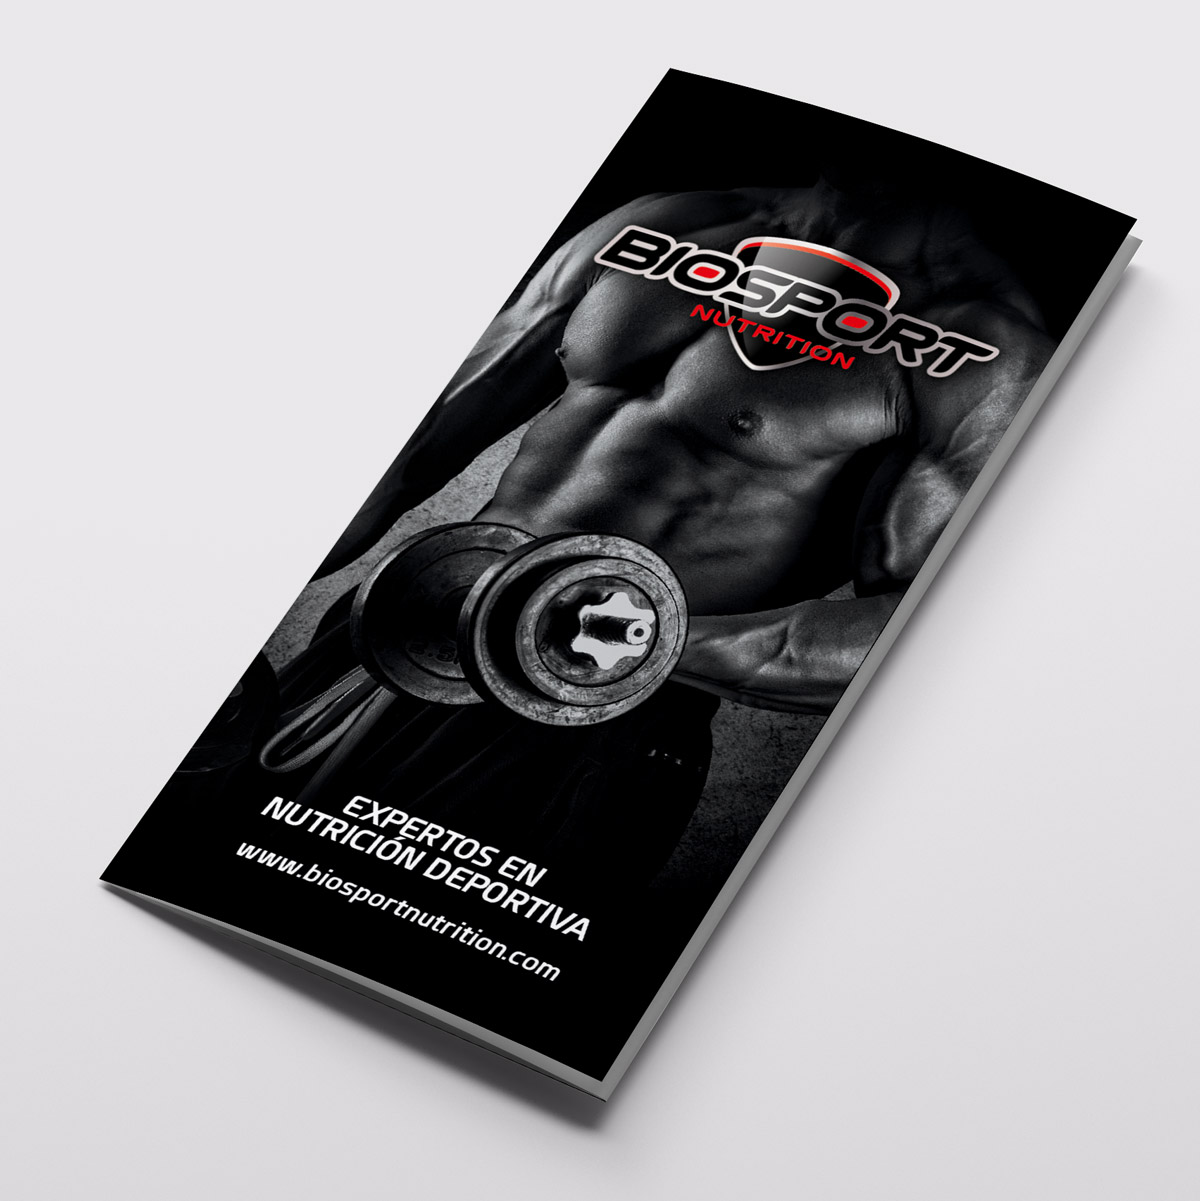 folleto biosport